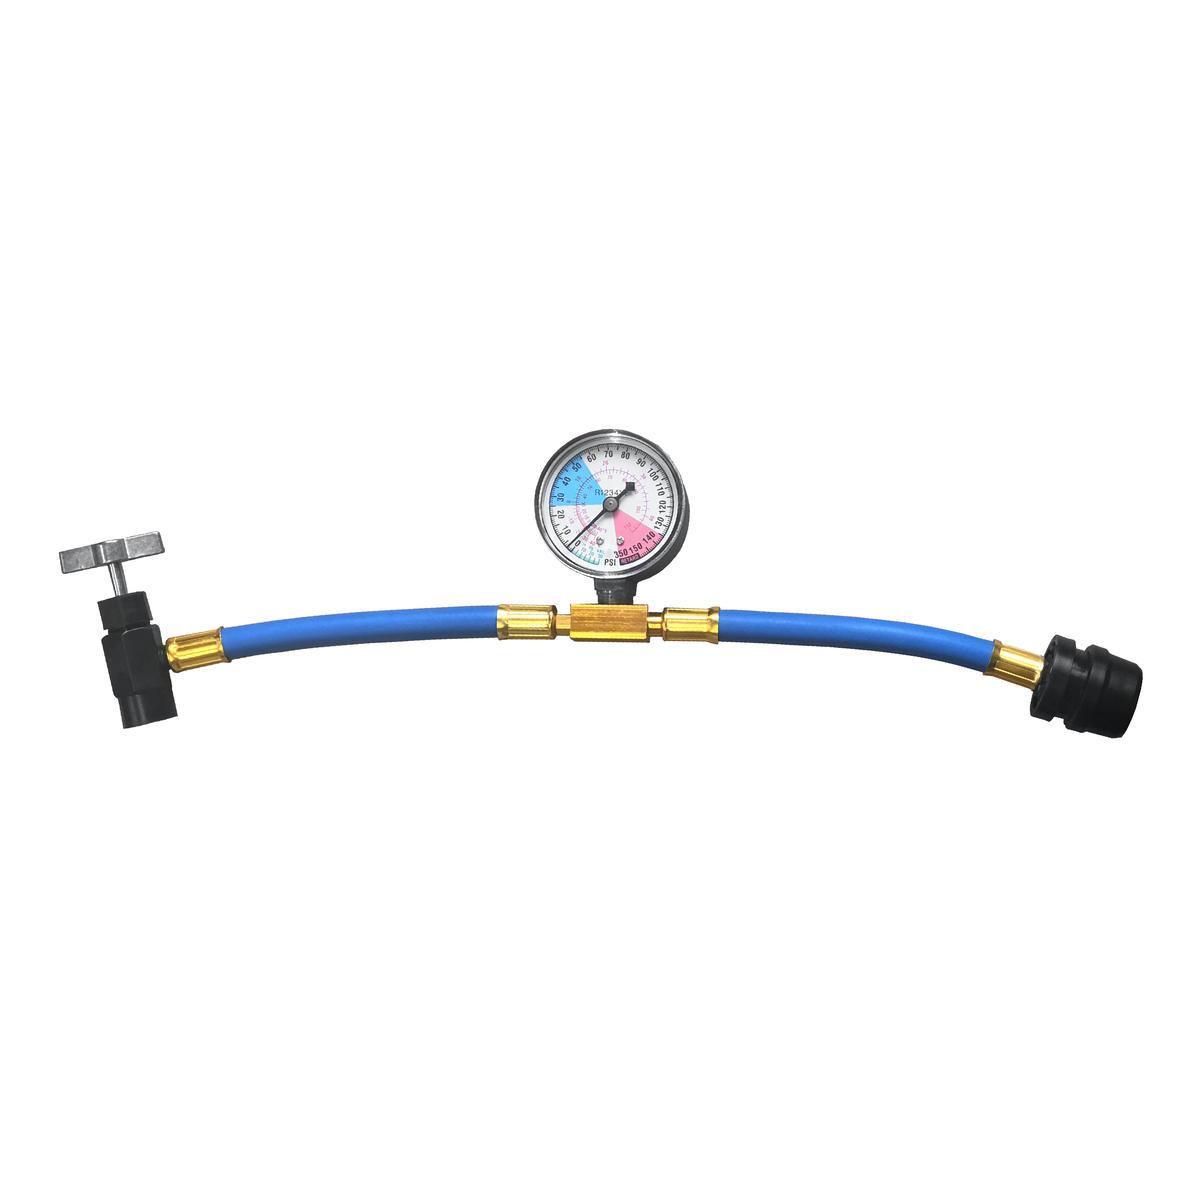 Car AC Aircon Air Con R1234YF Recharge Gas Regas DIY Tool Hose Pipe With Gauge